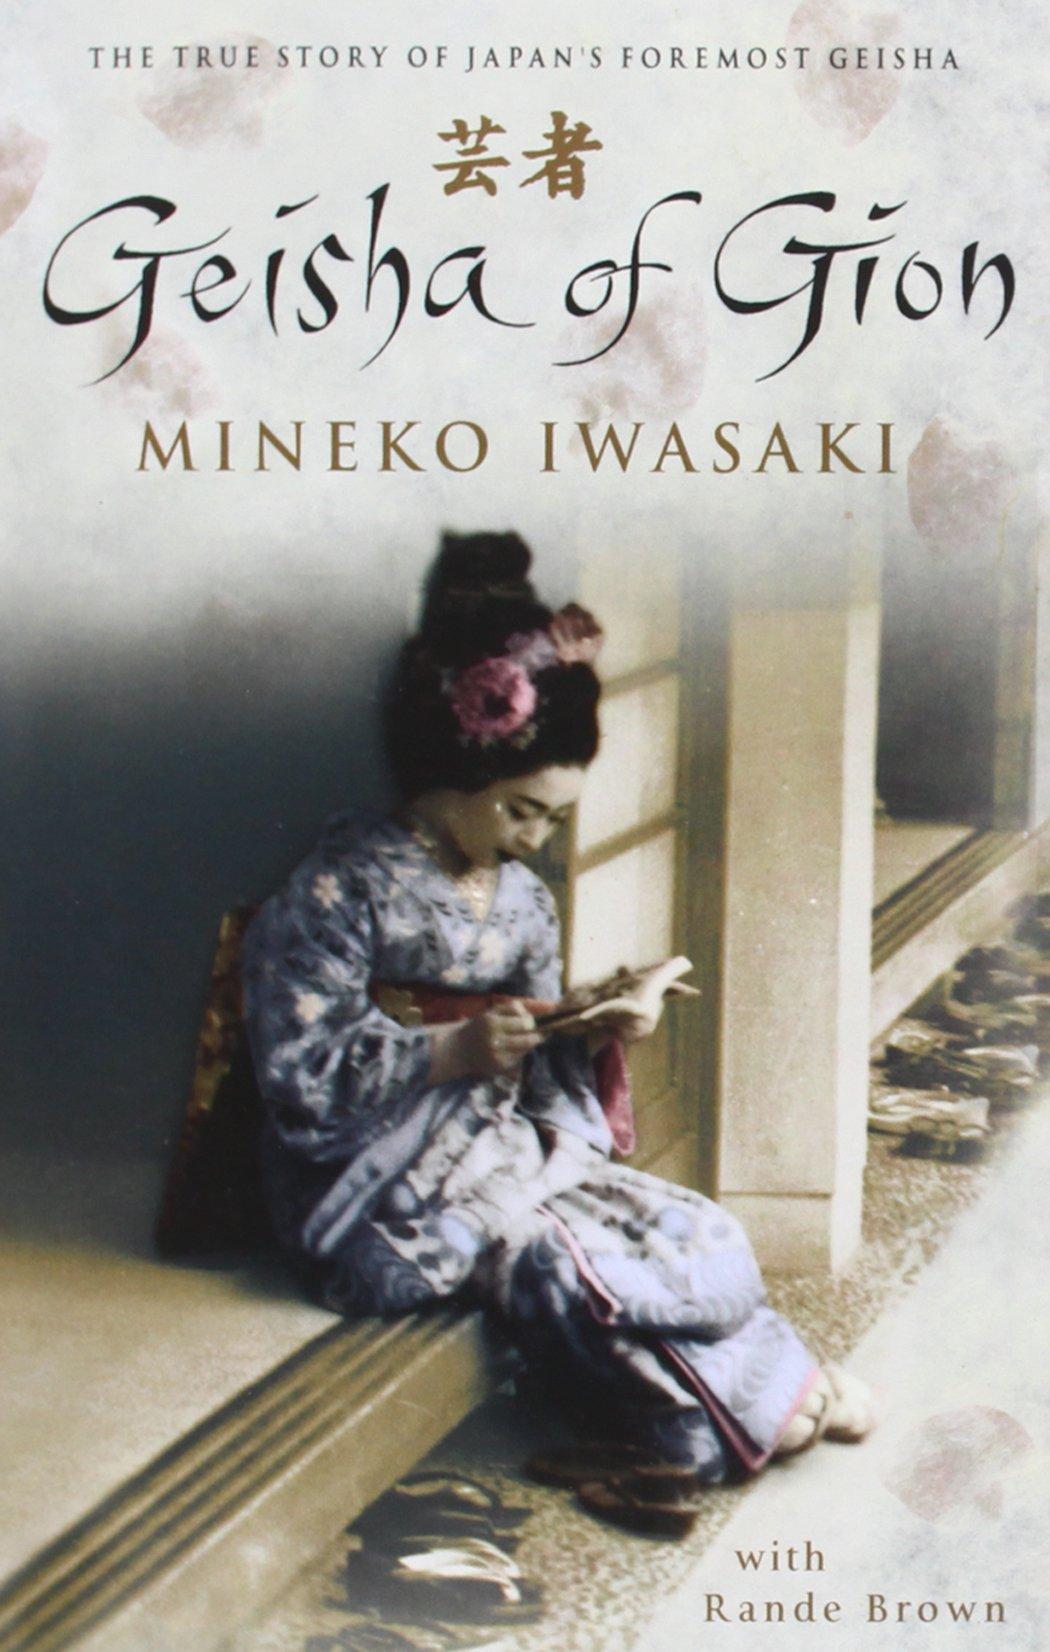 Geisha of Gion (Storia proibita di una geisha)